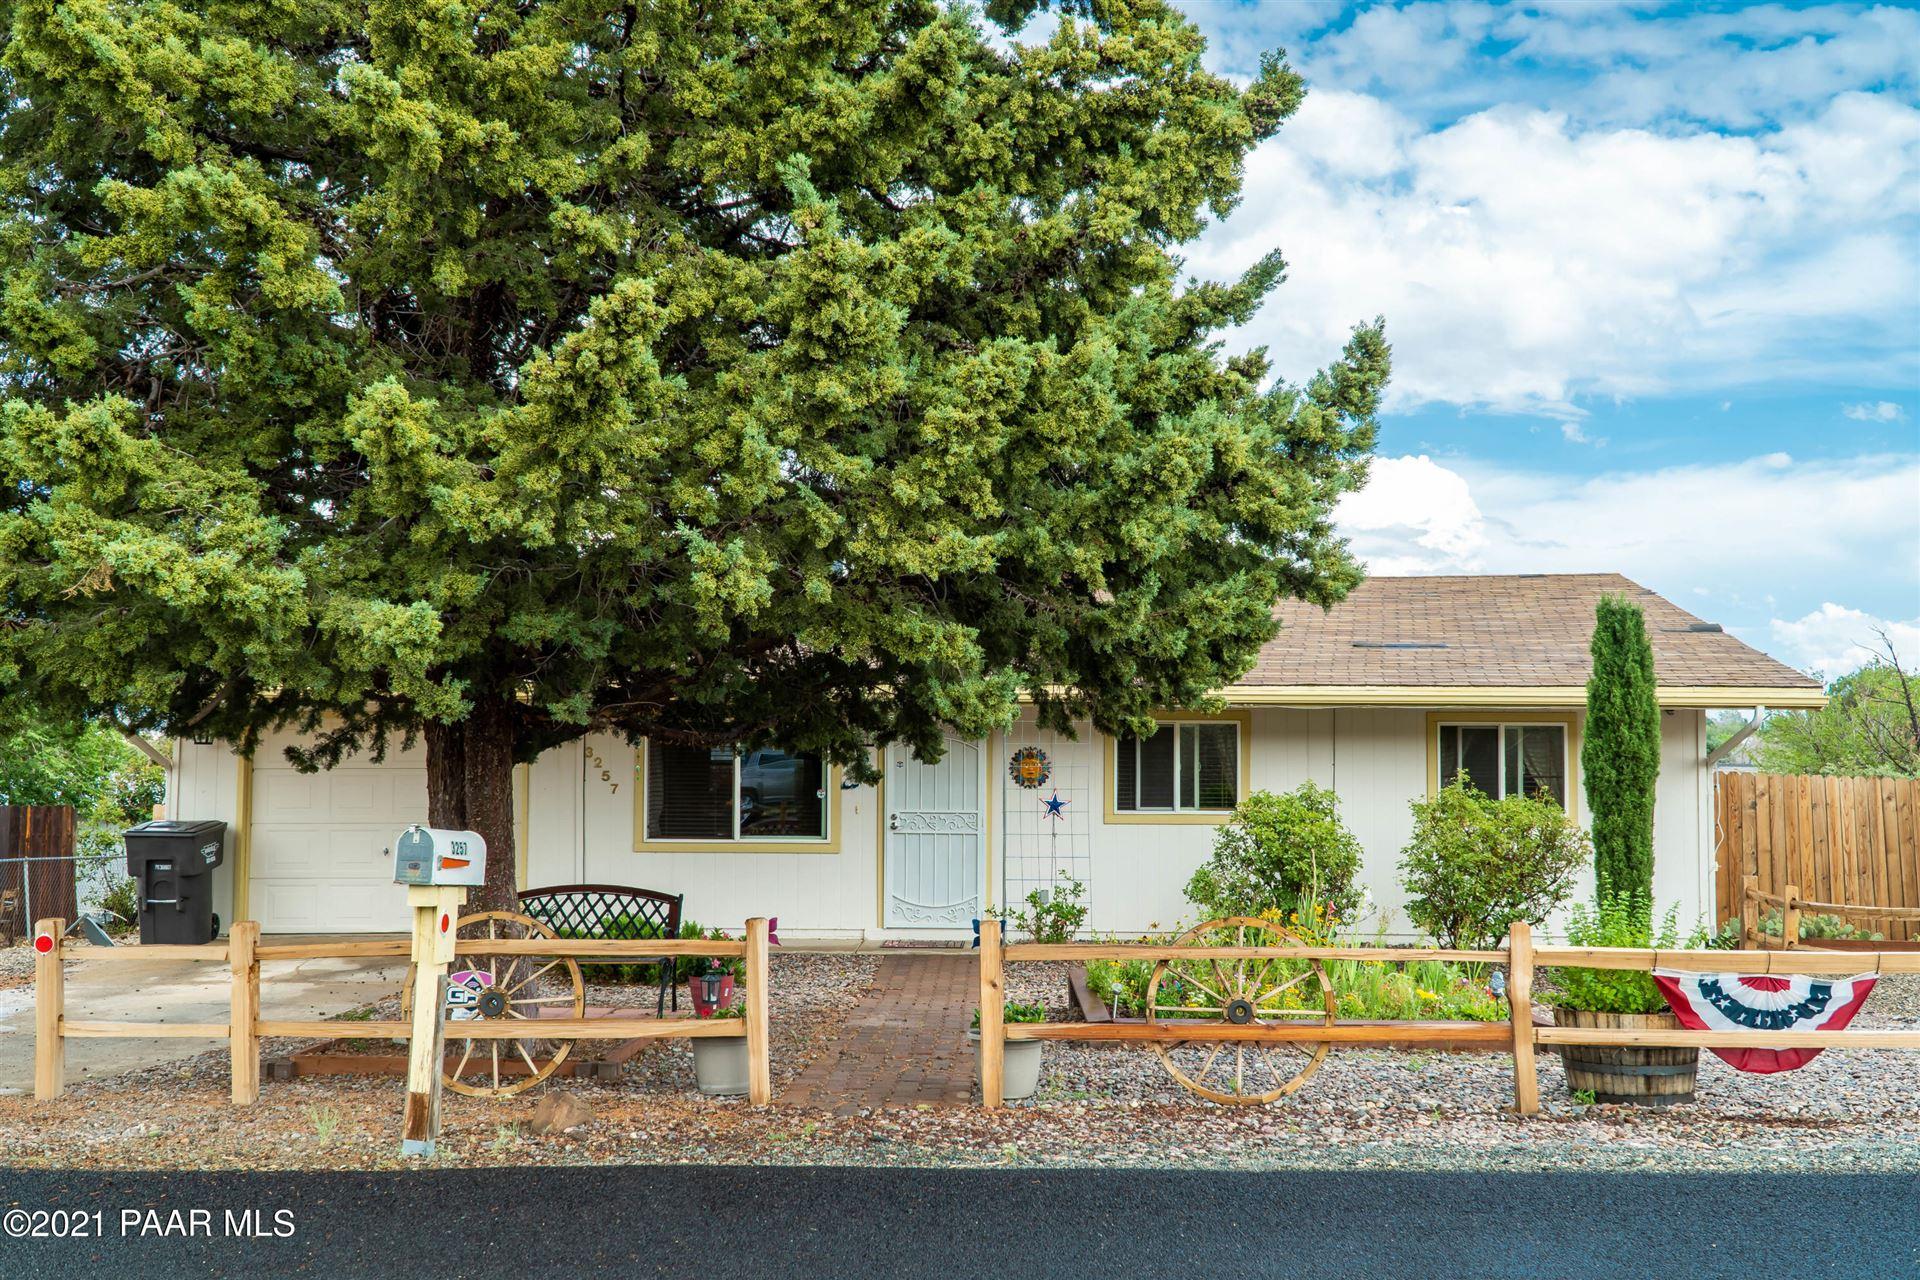 Photo of 3257 N Castle Drive #Lot: 450, Prescott Valley, AZ 86314 (MLS # 1040514)